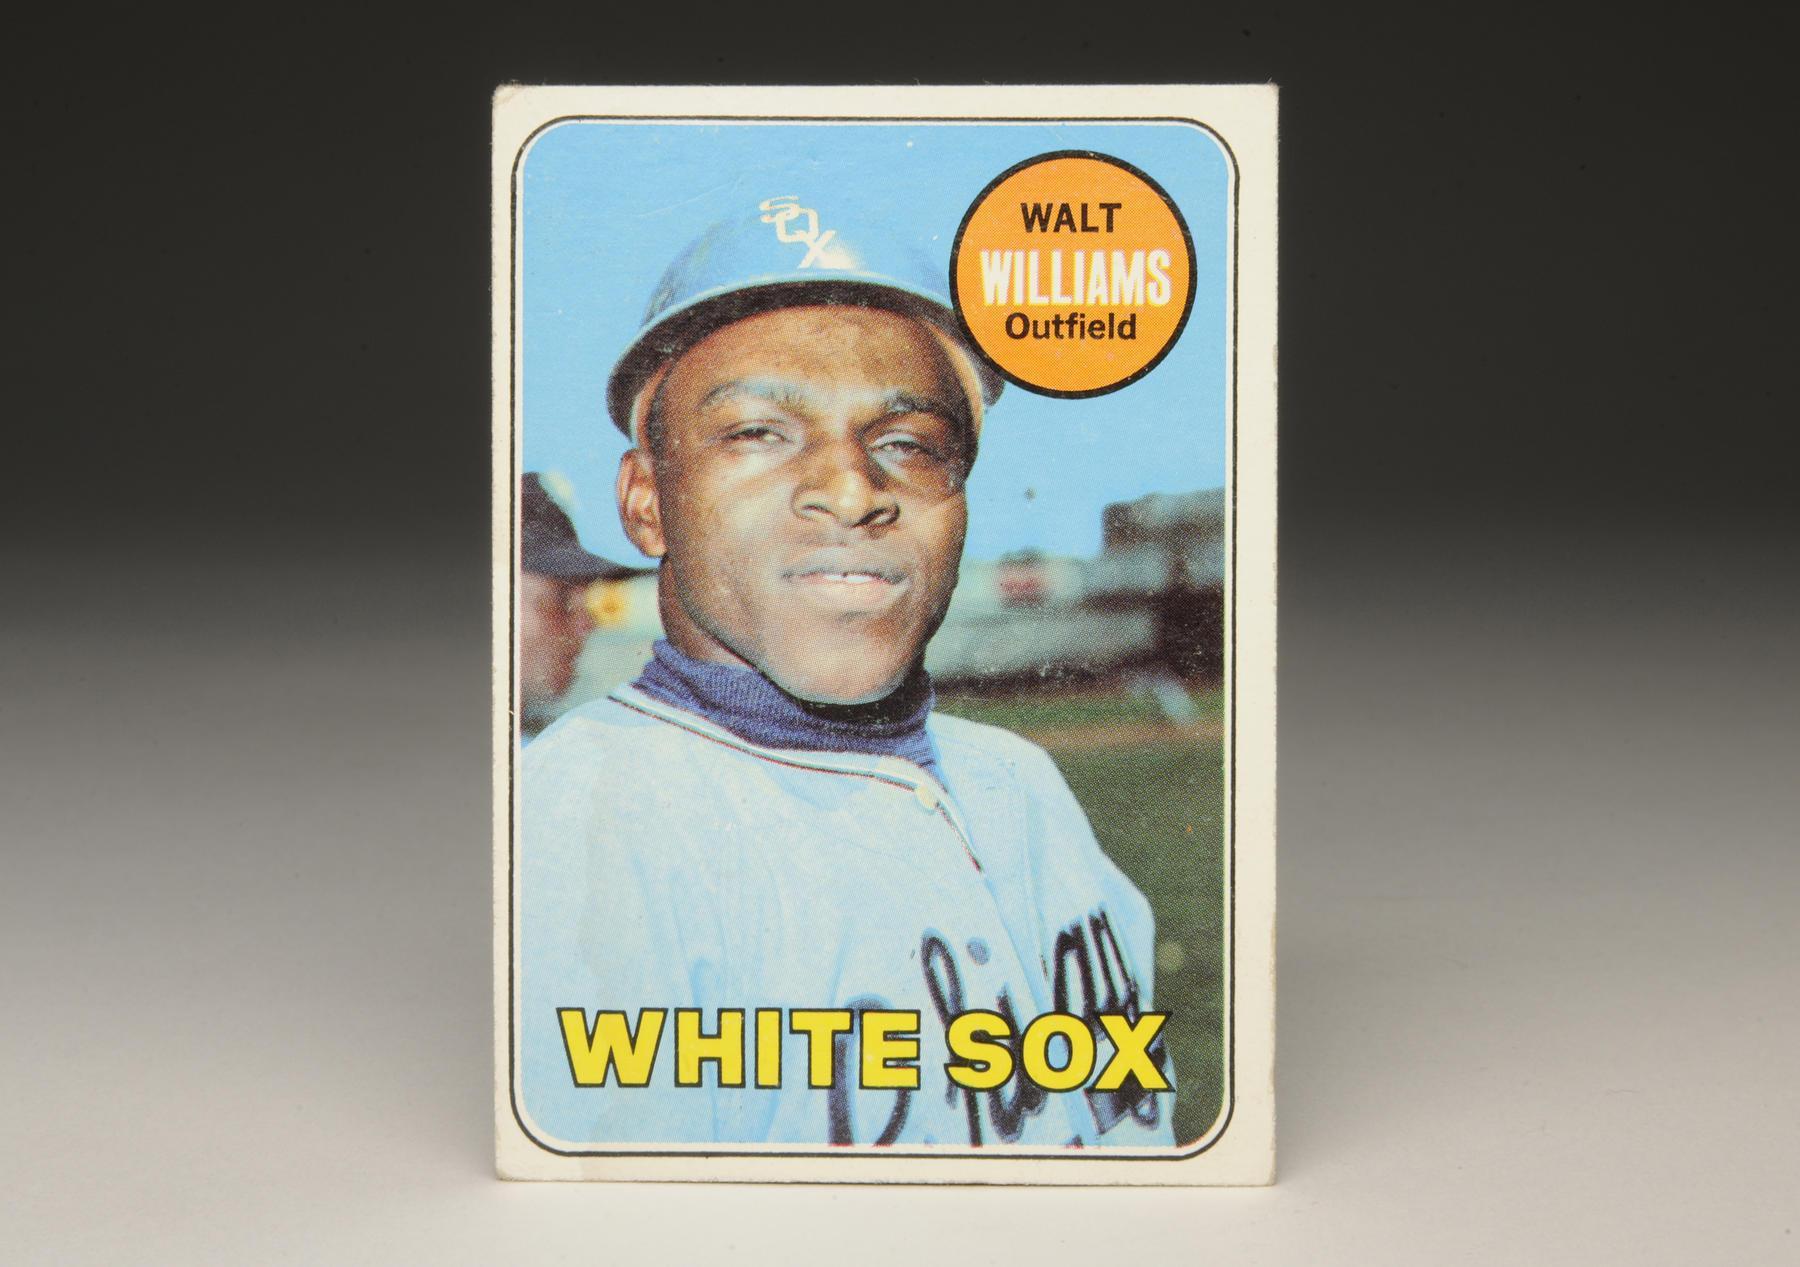 1969 Walt Williams Topps card.(Milo Stewart, Jr. / National Baseball Hall of Fame)